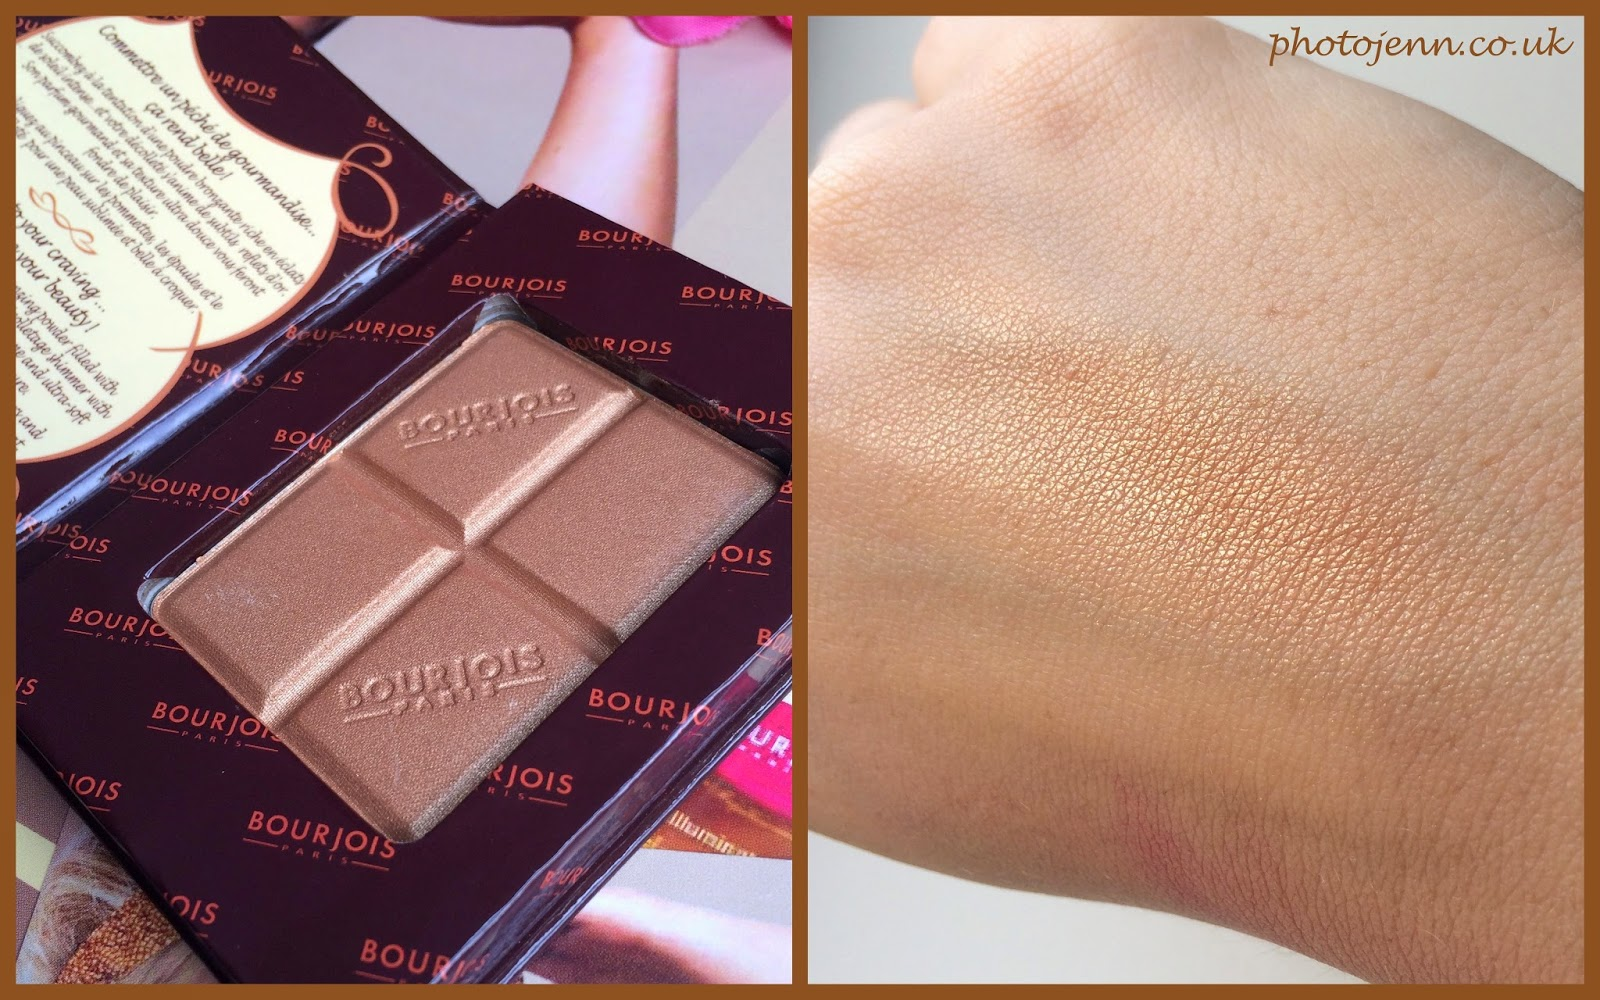 delice-de-poudre-gold-bronzing-powder-swatches